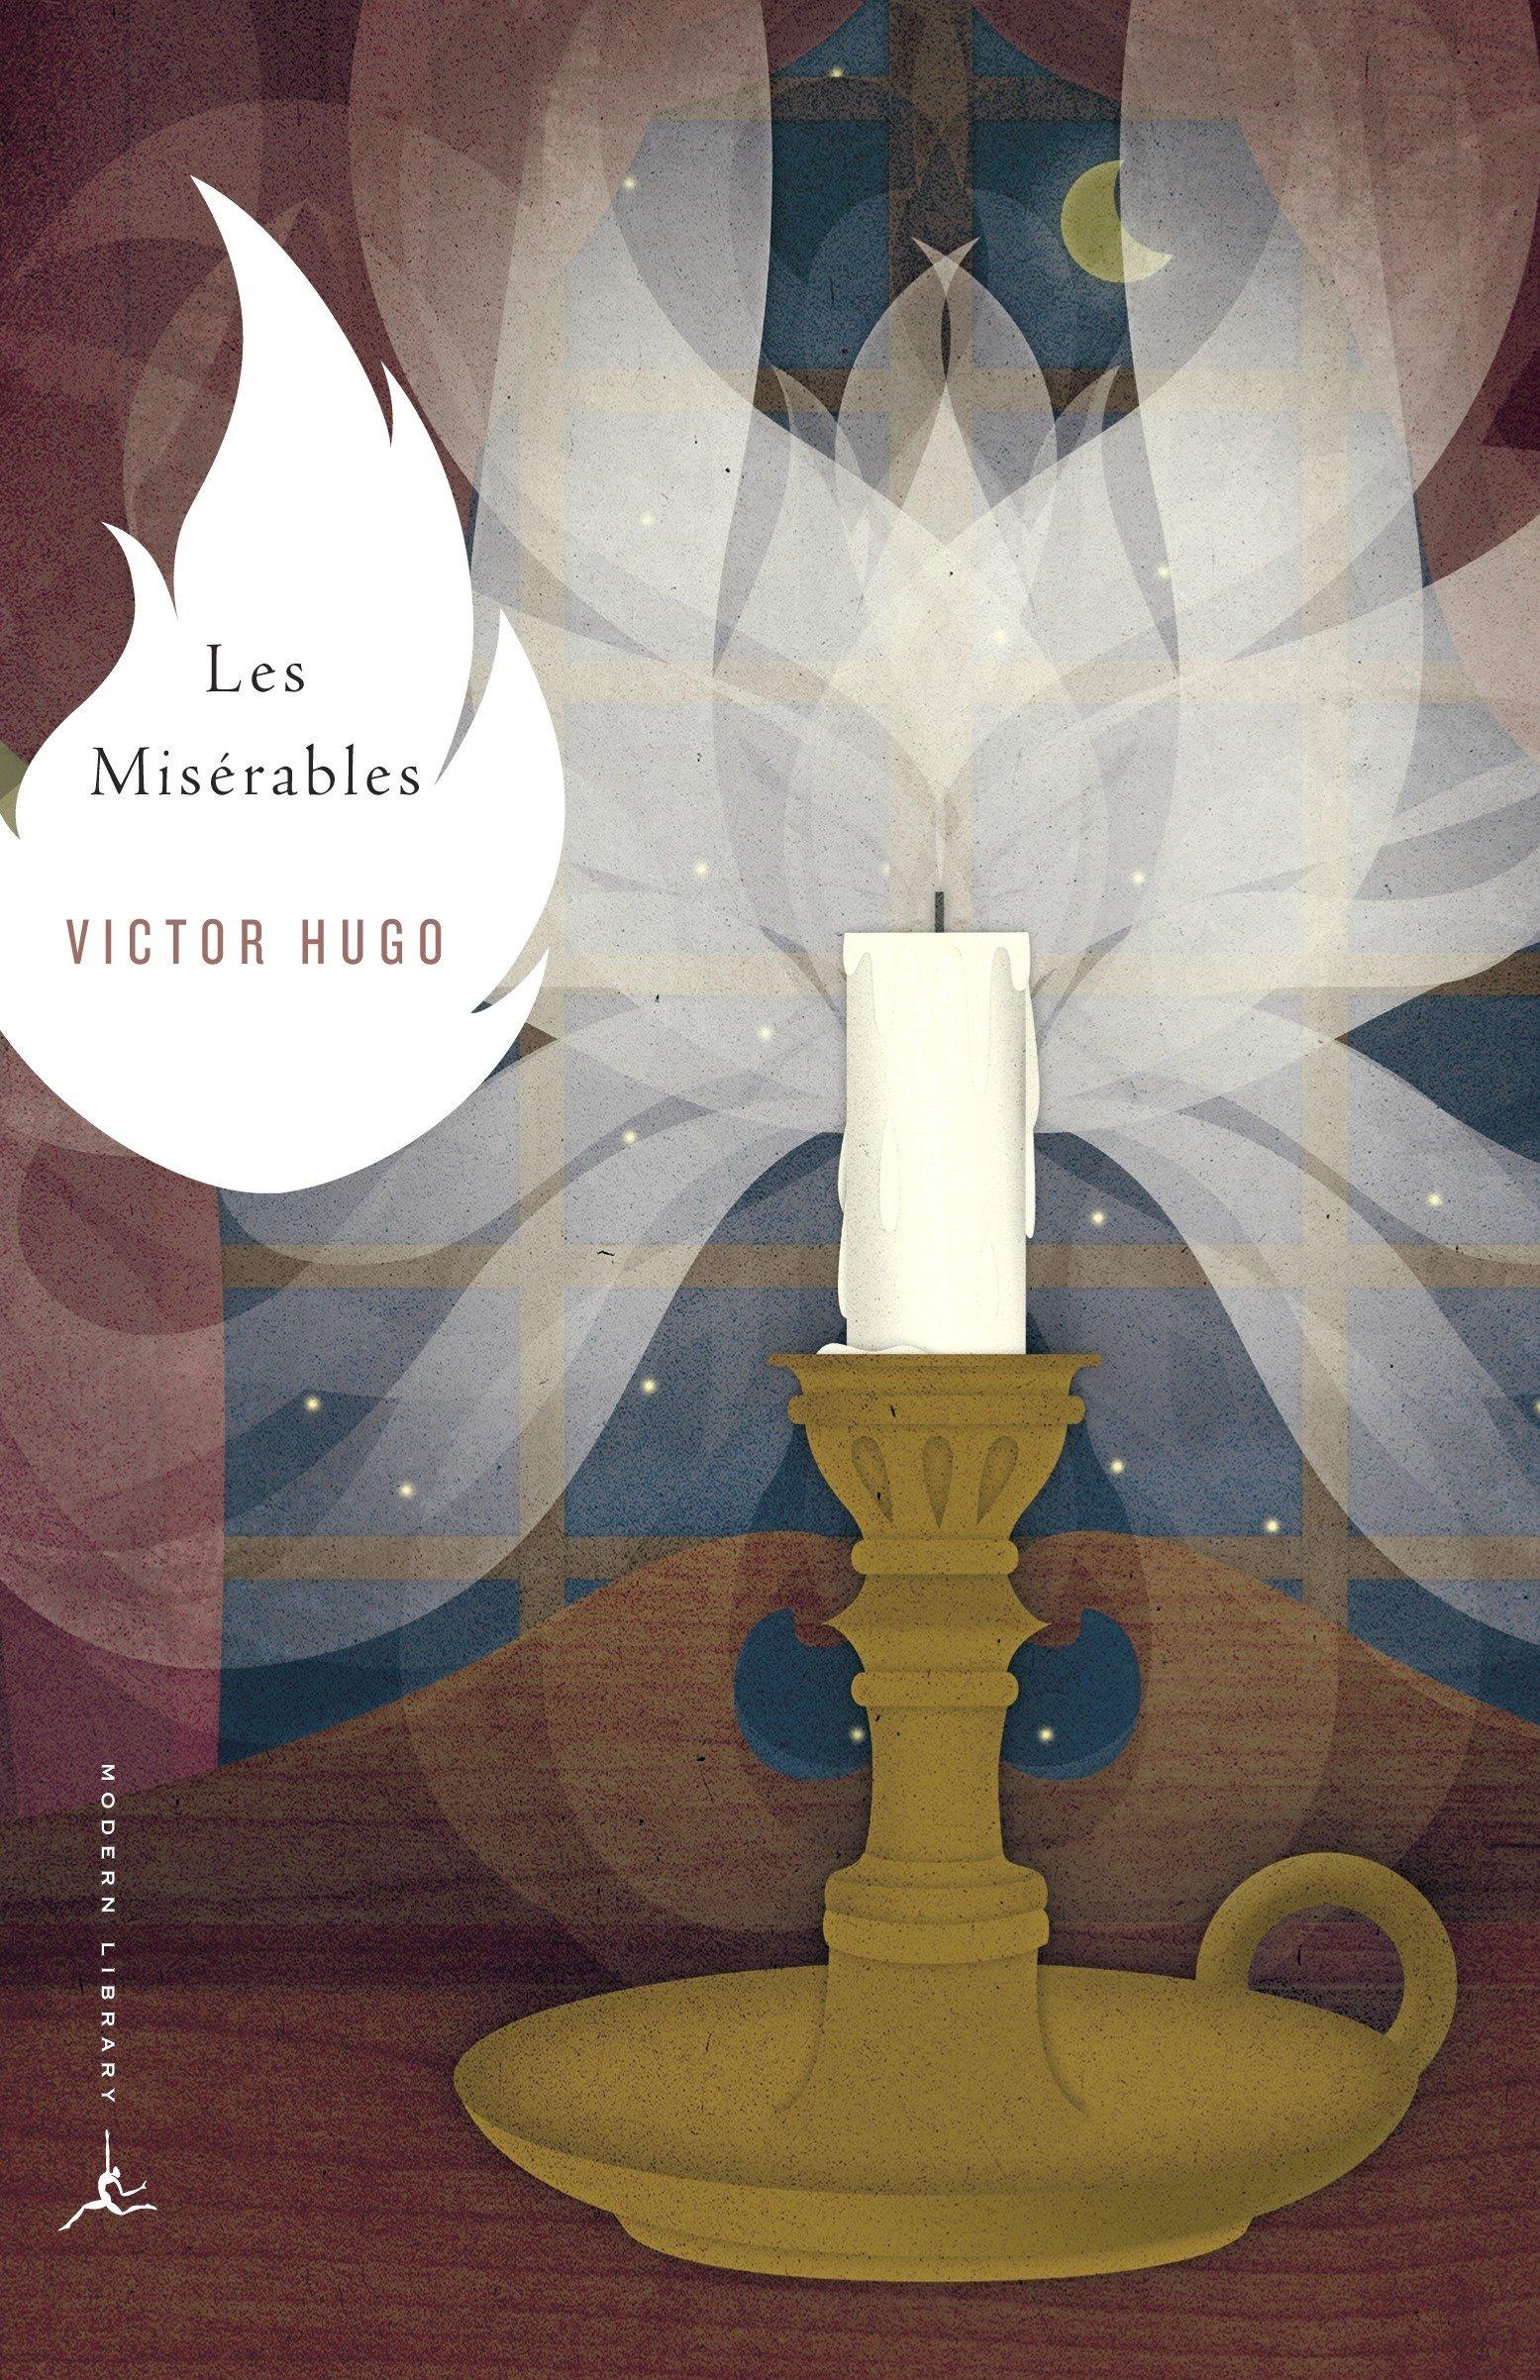 Les Misérables (Modern Library Classics) pdf epub